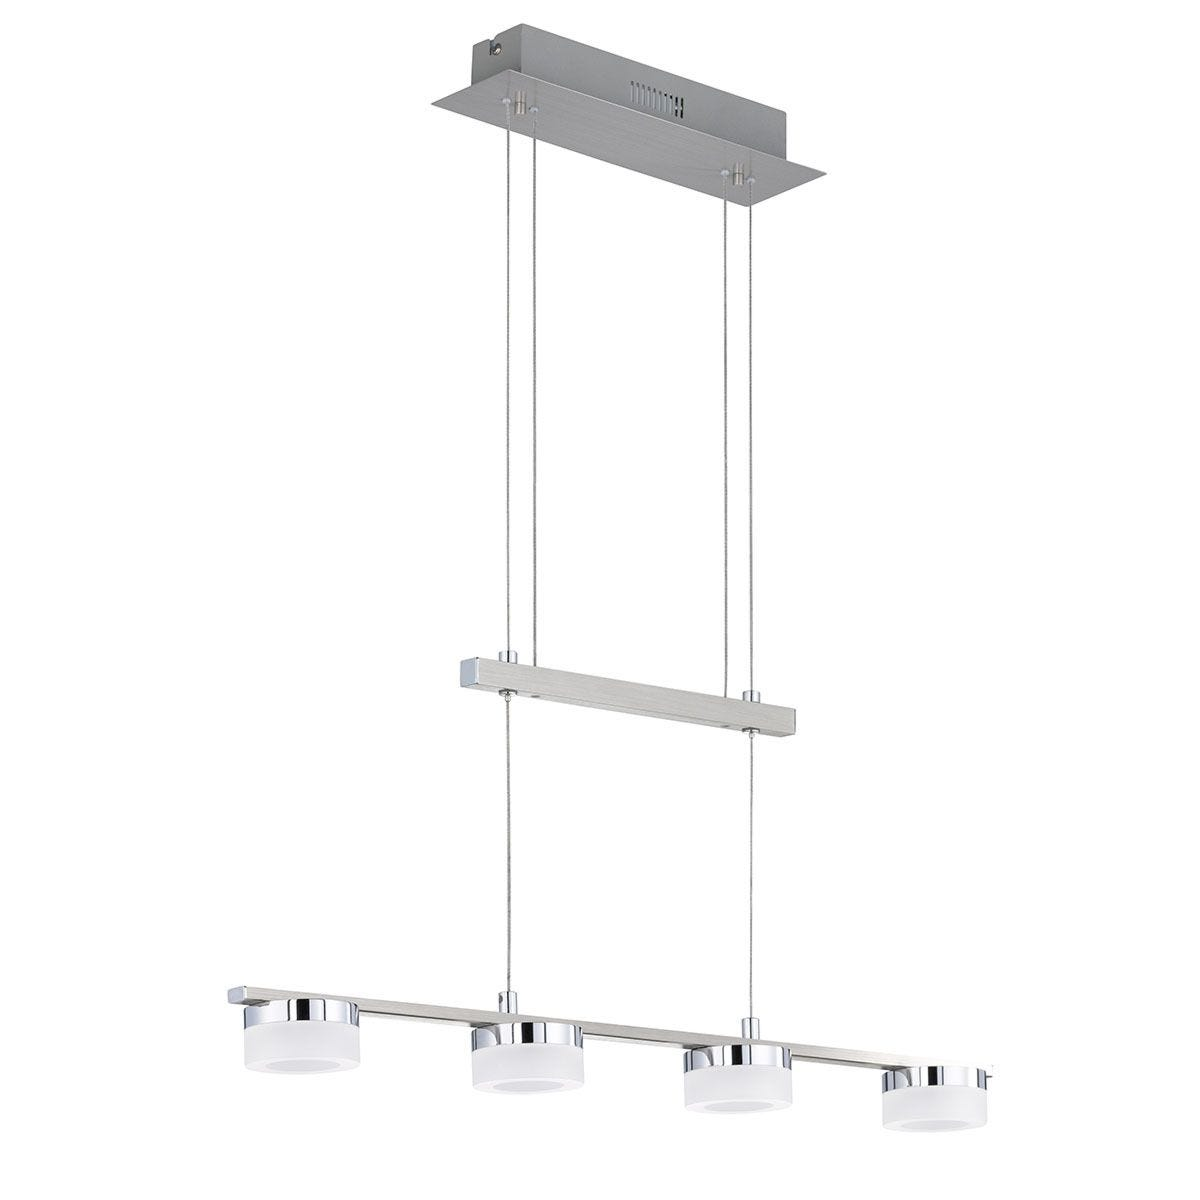 Wofi Logan 4-LED Pendant Bar/Spotlight -Nickel Matt Finished & Chrome